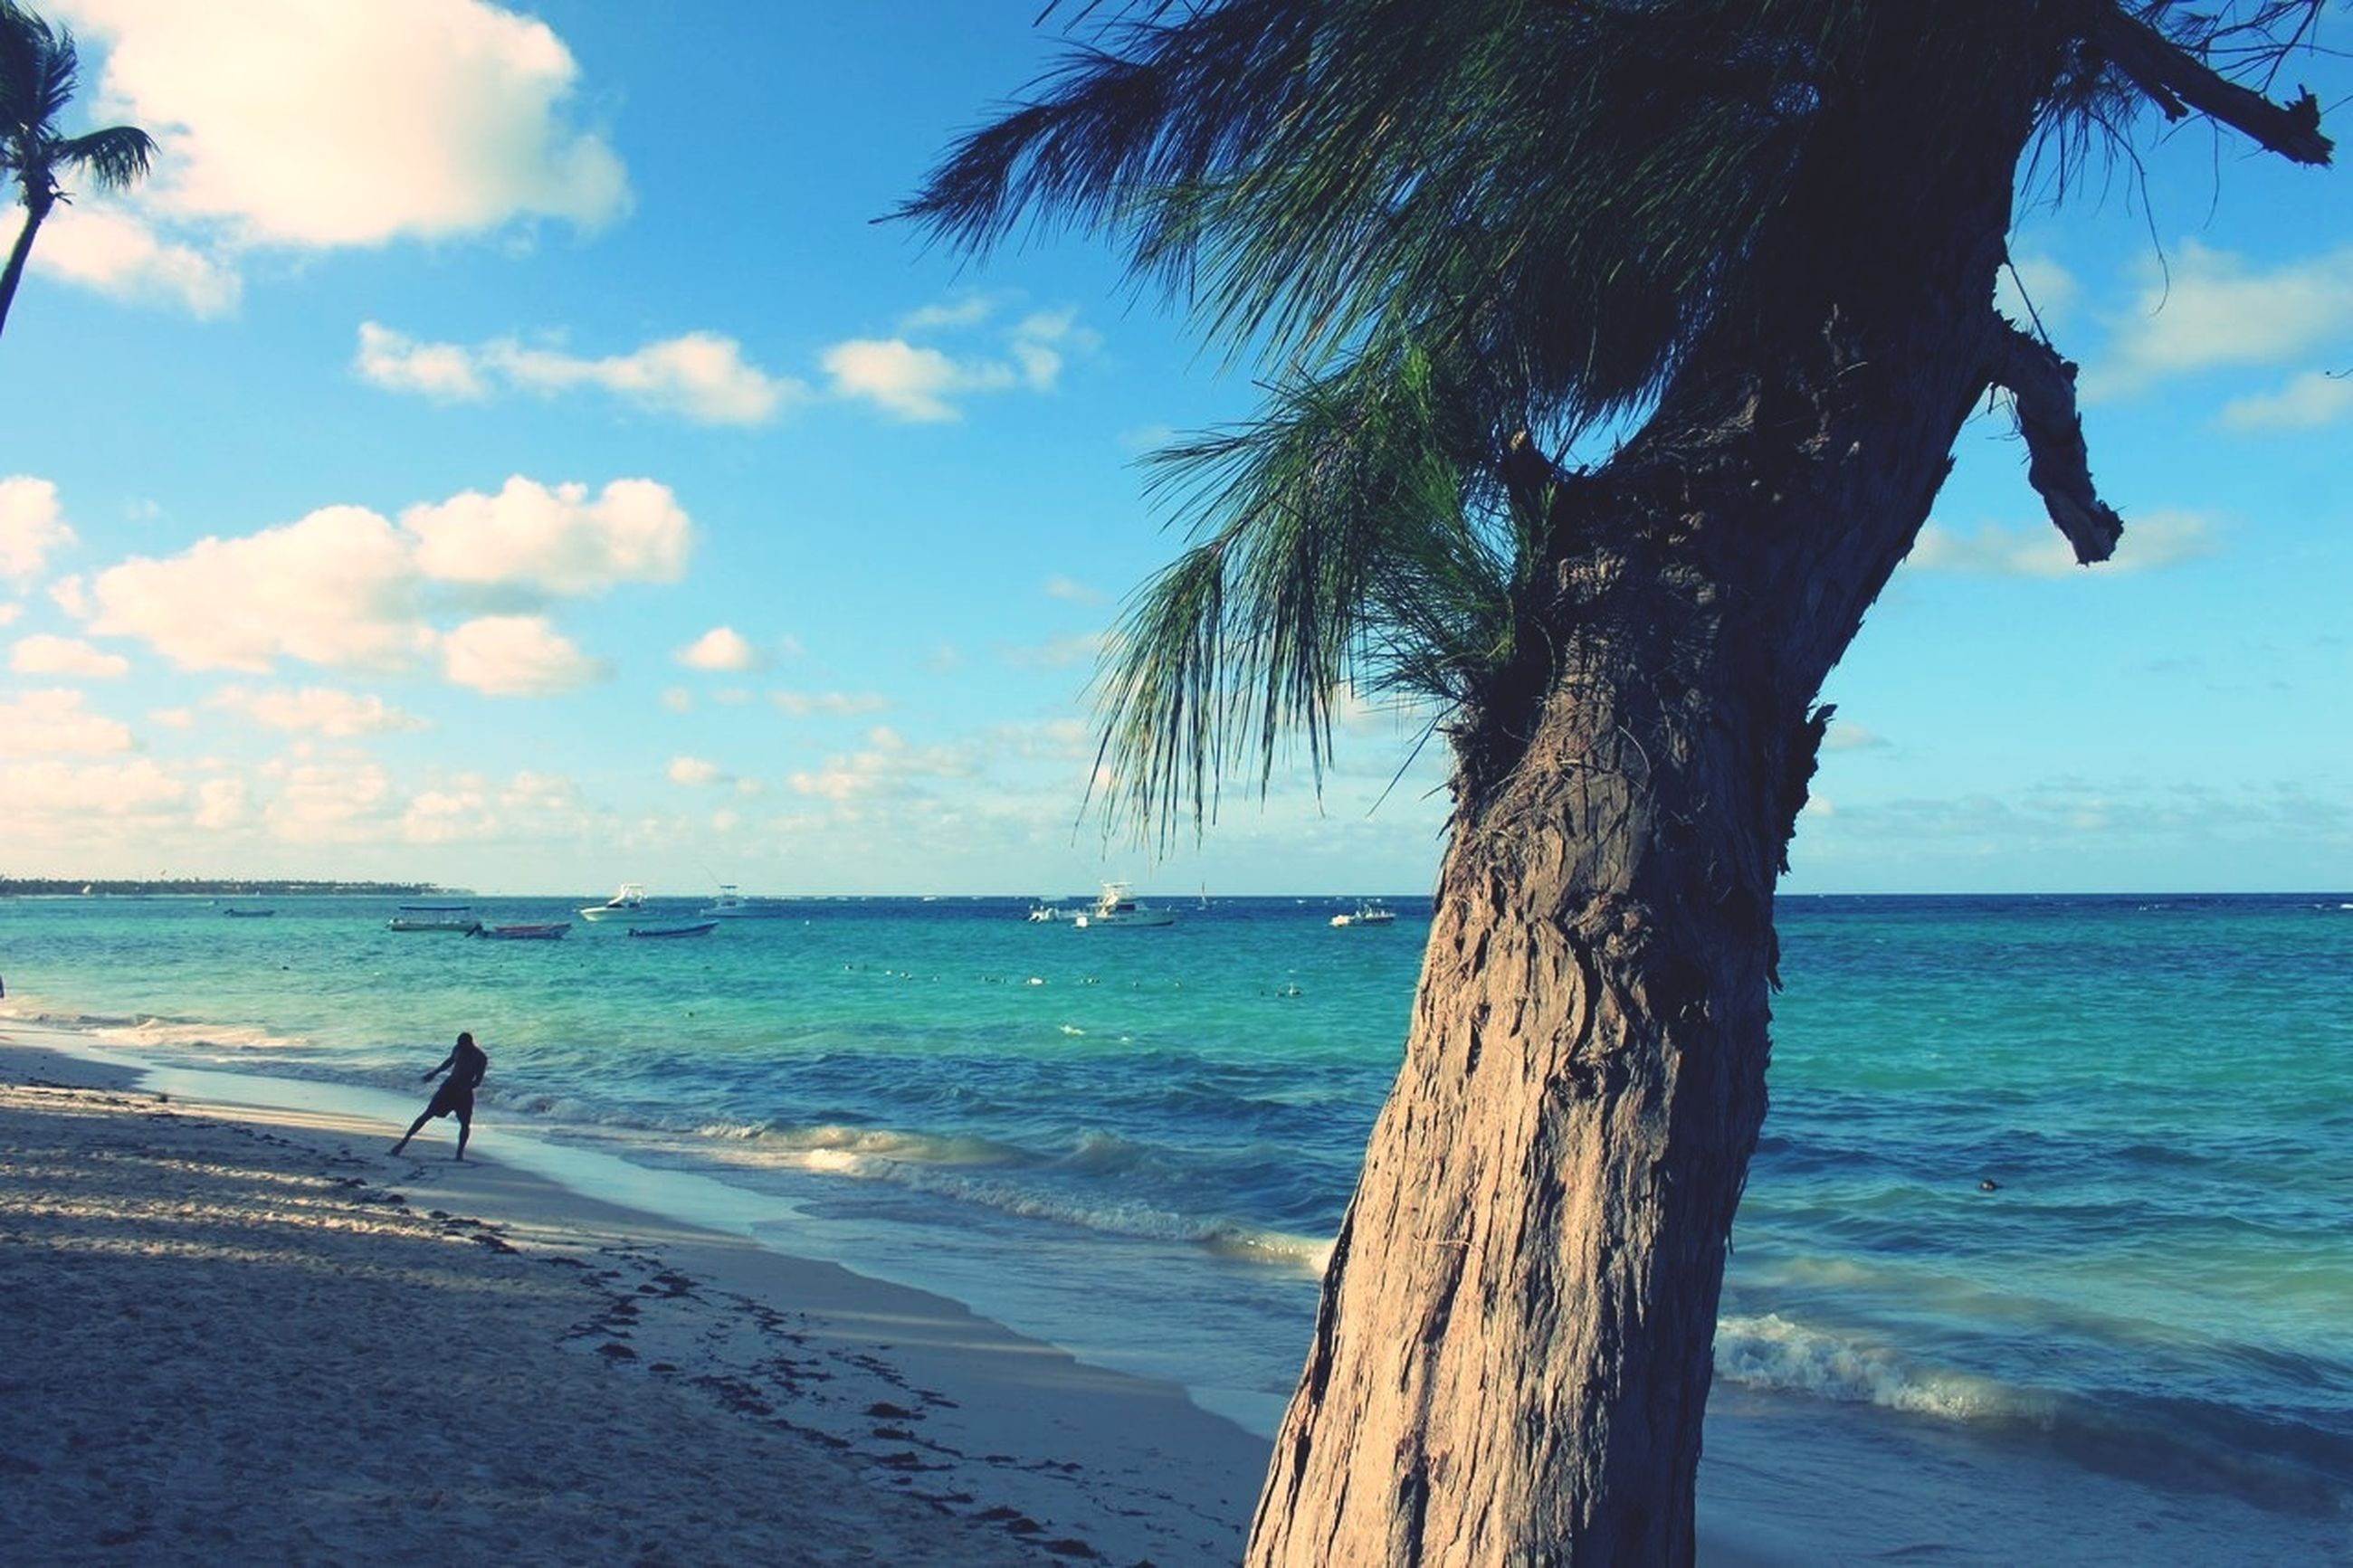 sea, horizon over water, sky, water, beach, tranquility, shore, tree, tranquil scene, scenics, tree trunk, beauty in nature, blue, cloud, nature, cloud - sky, palm tree, idyllic, sand, sunlight